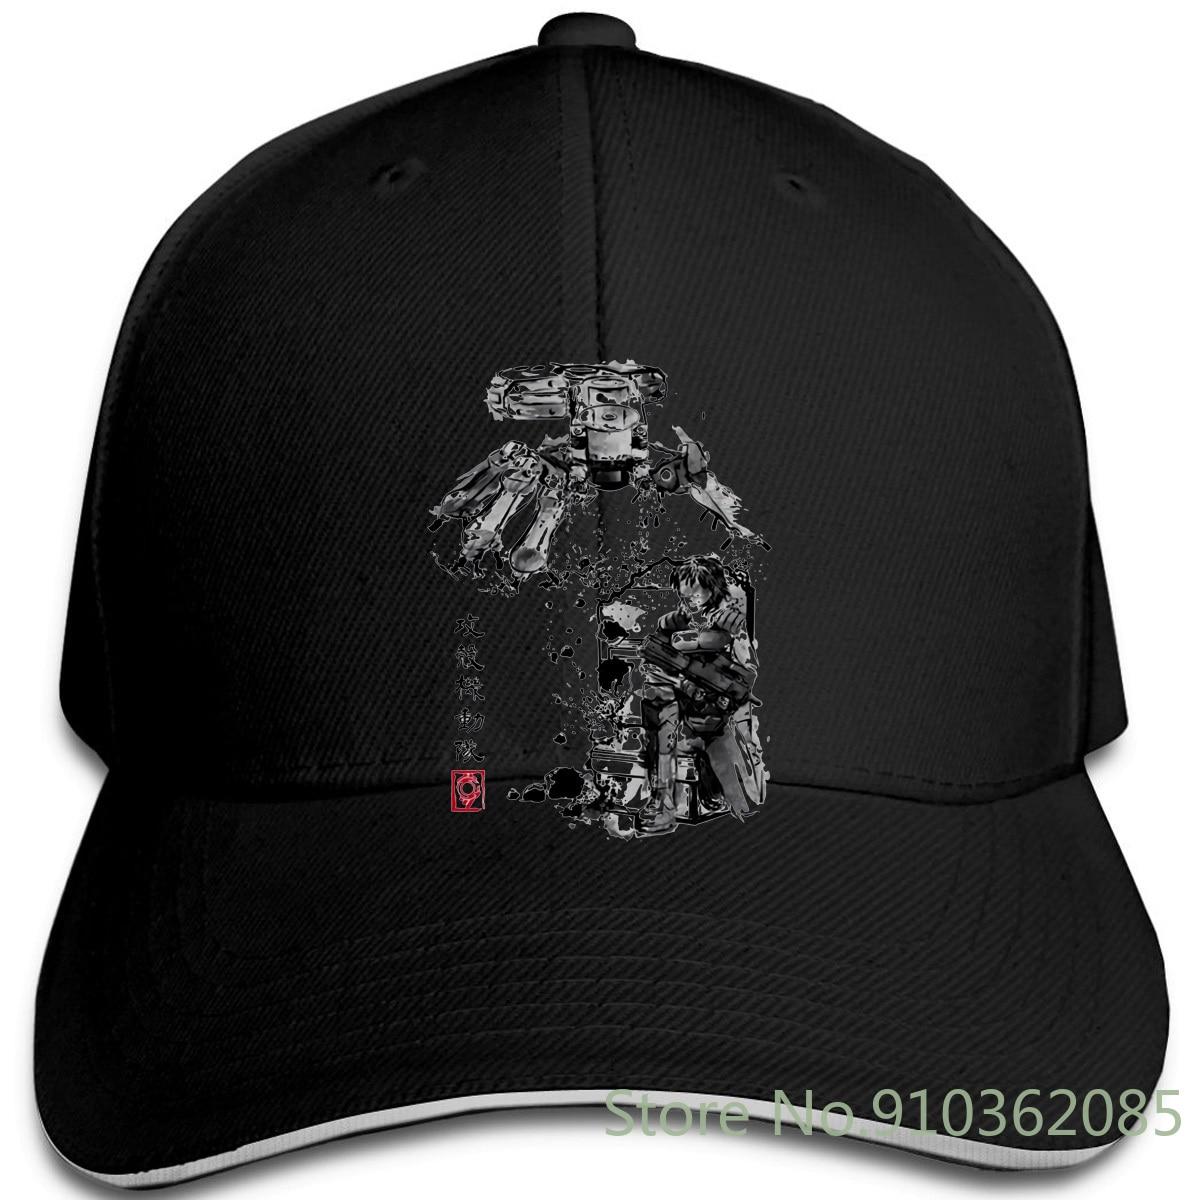 Yo-young Ghost In The Shell Major Vs Tank Impresión Digital 180gsm peinado gorras ajustables gorra de béisbol hombres mujeres